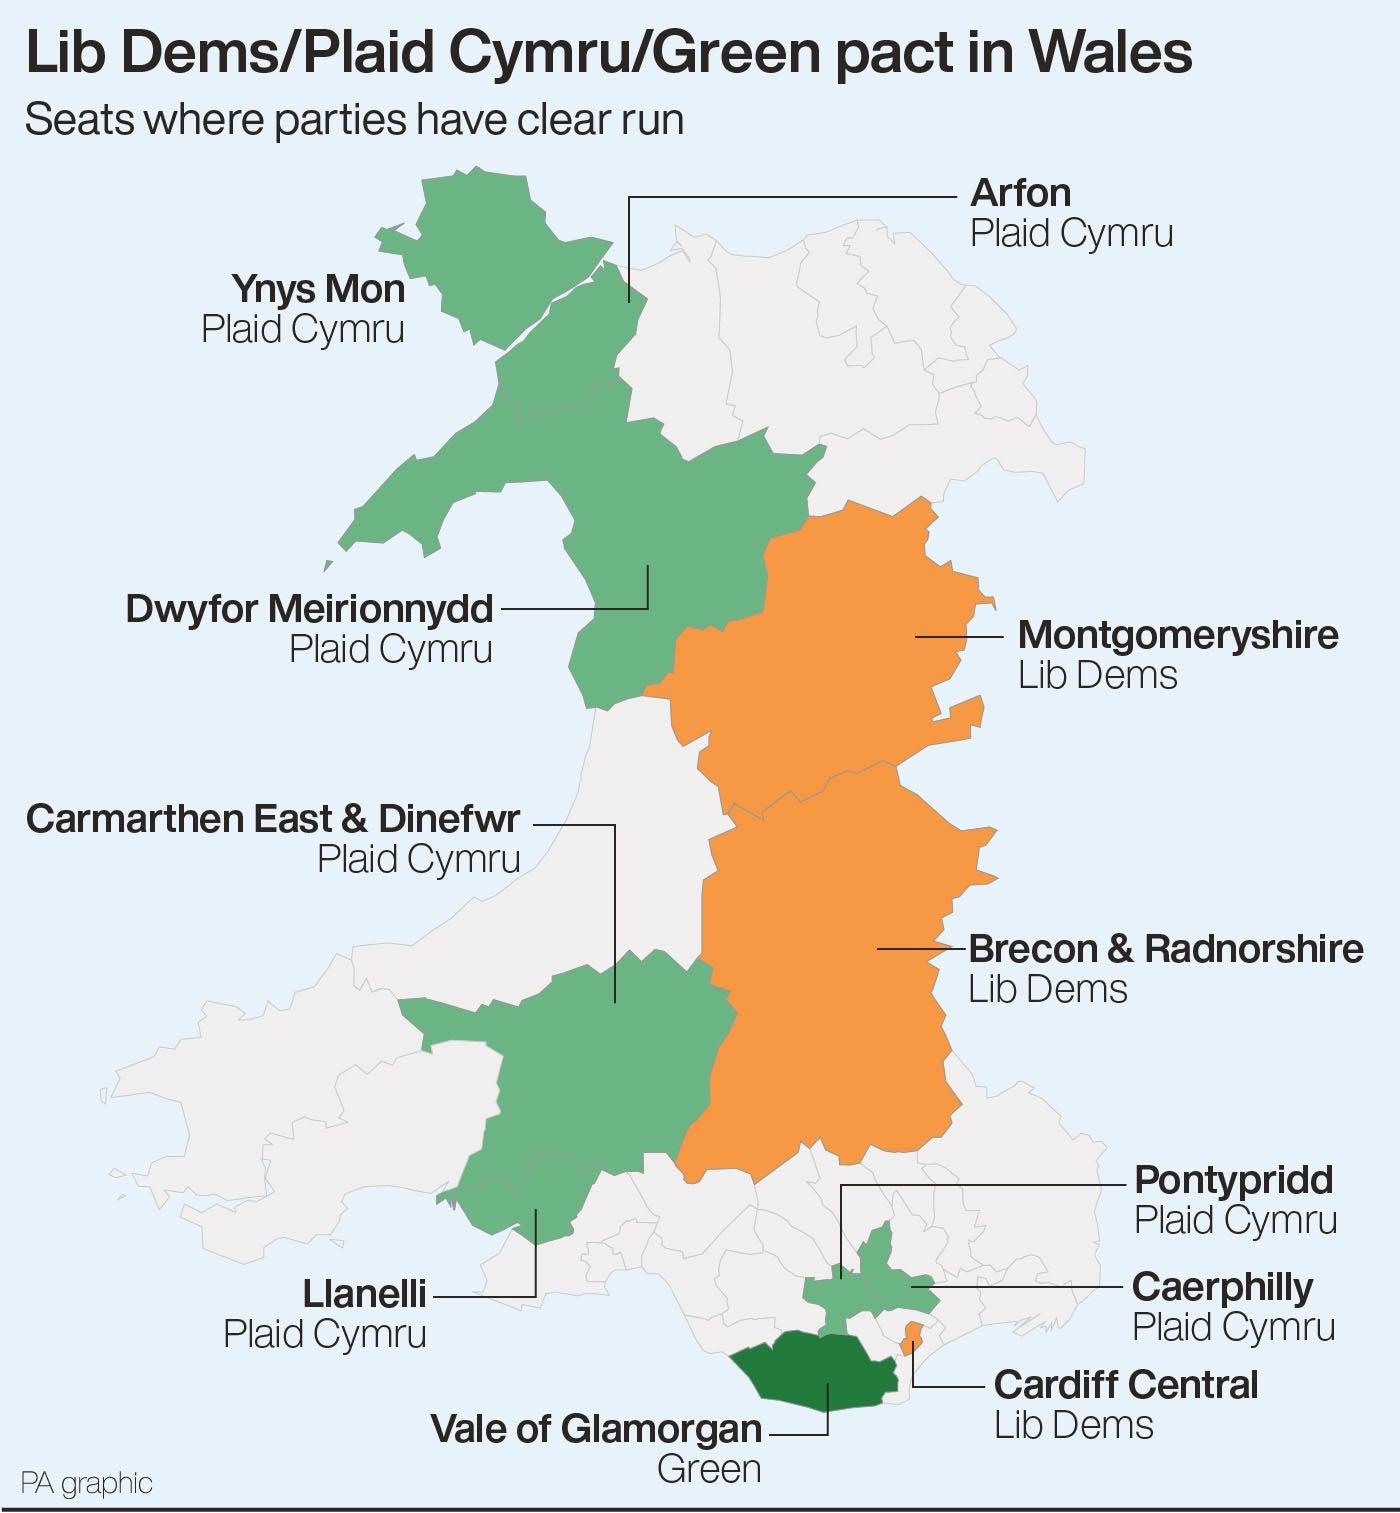 Lib Dems/Plaid Cymru/Green pact in Wales